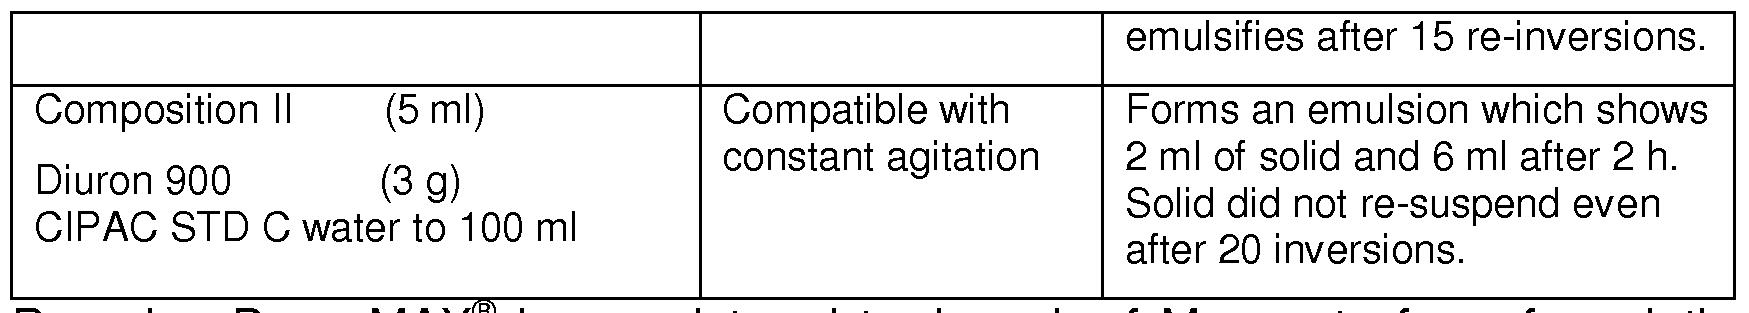 csbp flexi n handbook combatability